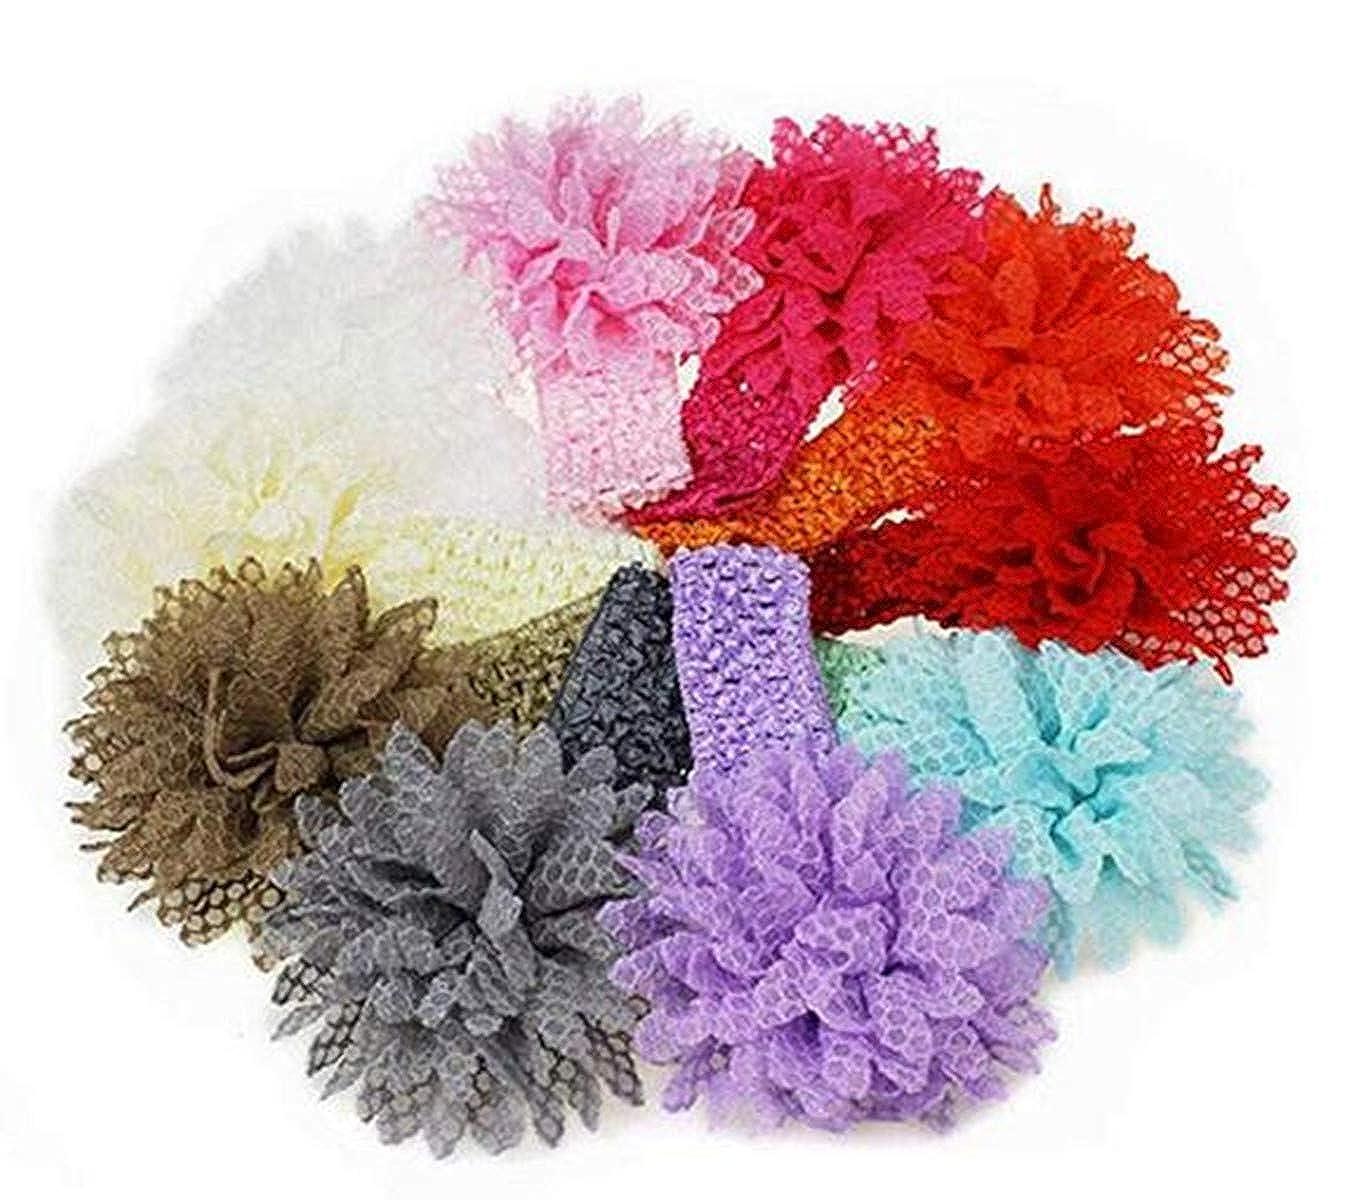 De feuilles Baby Haarband 10 St/ück Stirnband Elastisch Band Schleife Blumen M/ädchen Haarschmuck